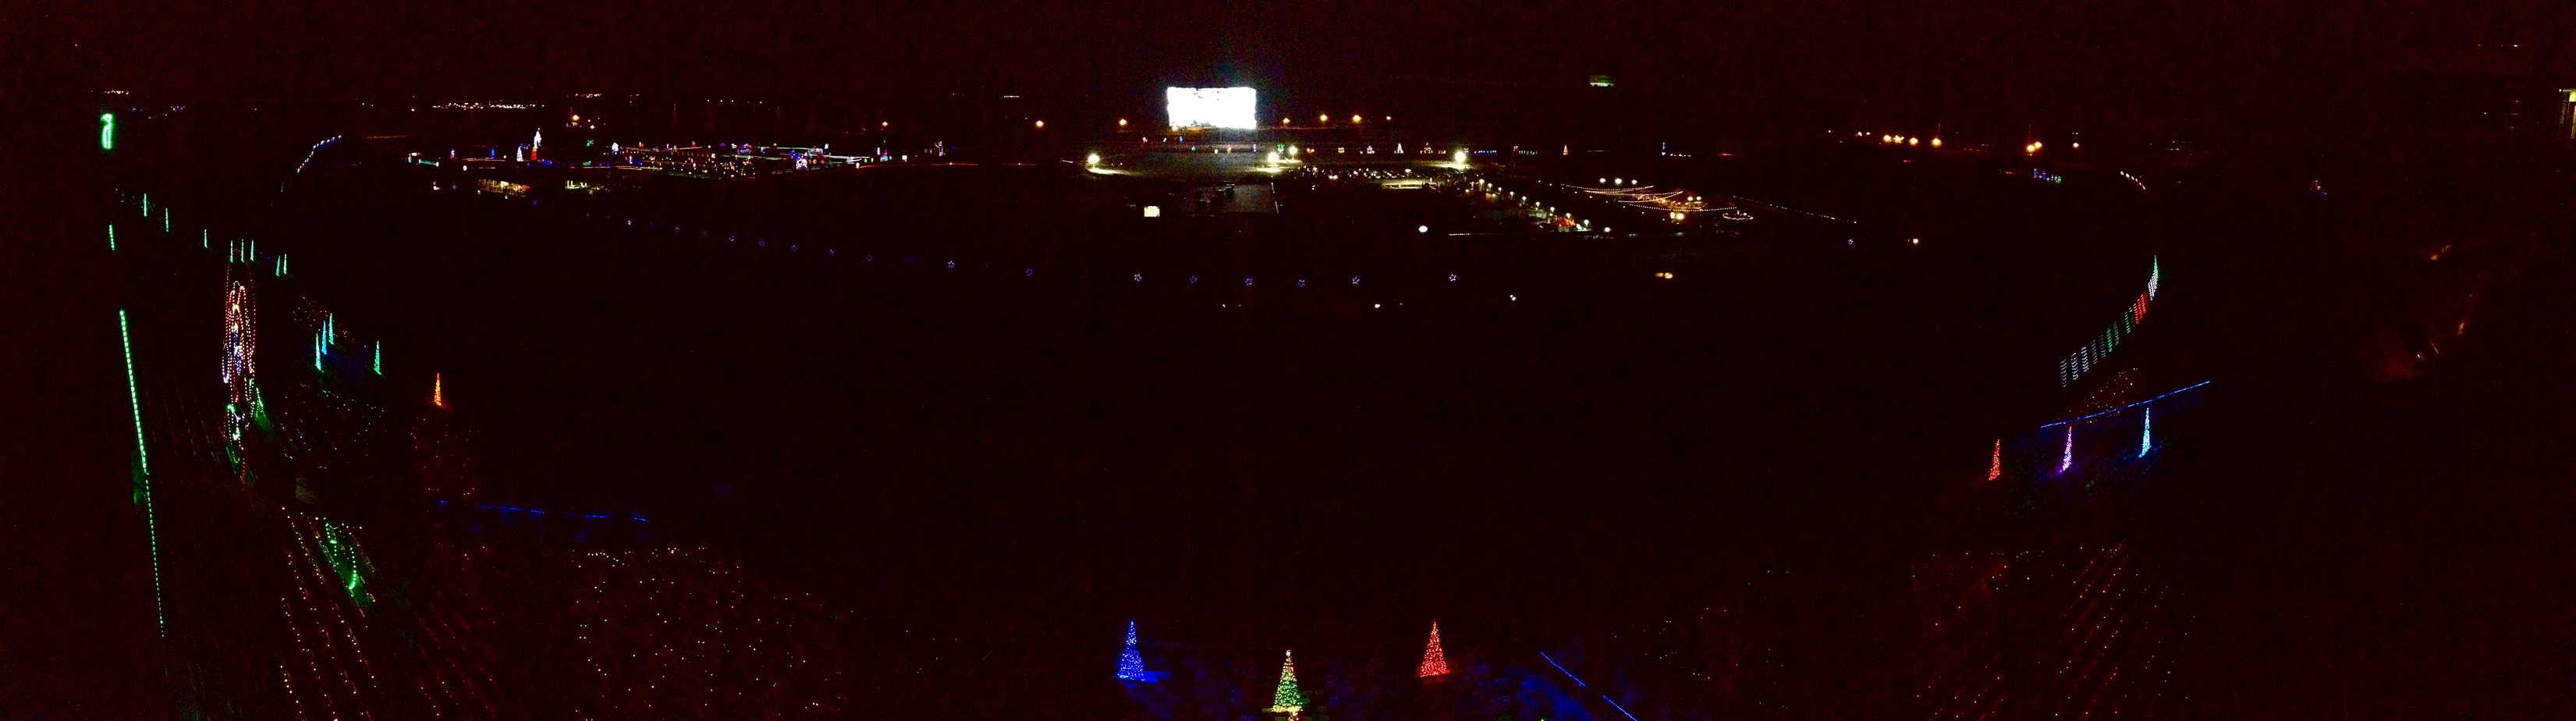 img_5307 - Charlotte Motor Speedway Christmas Lights 2014